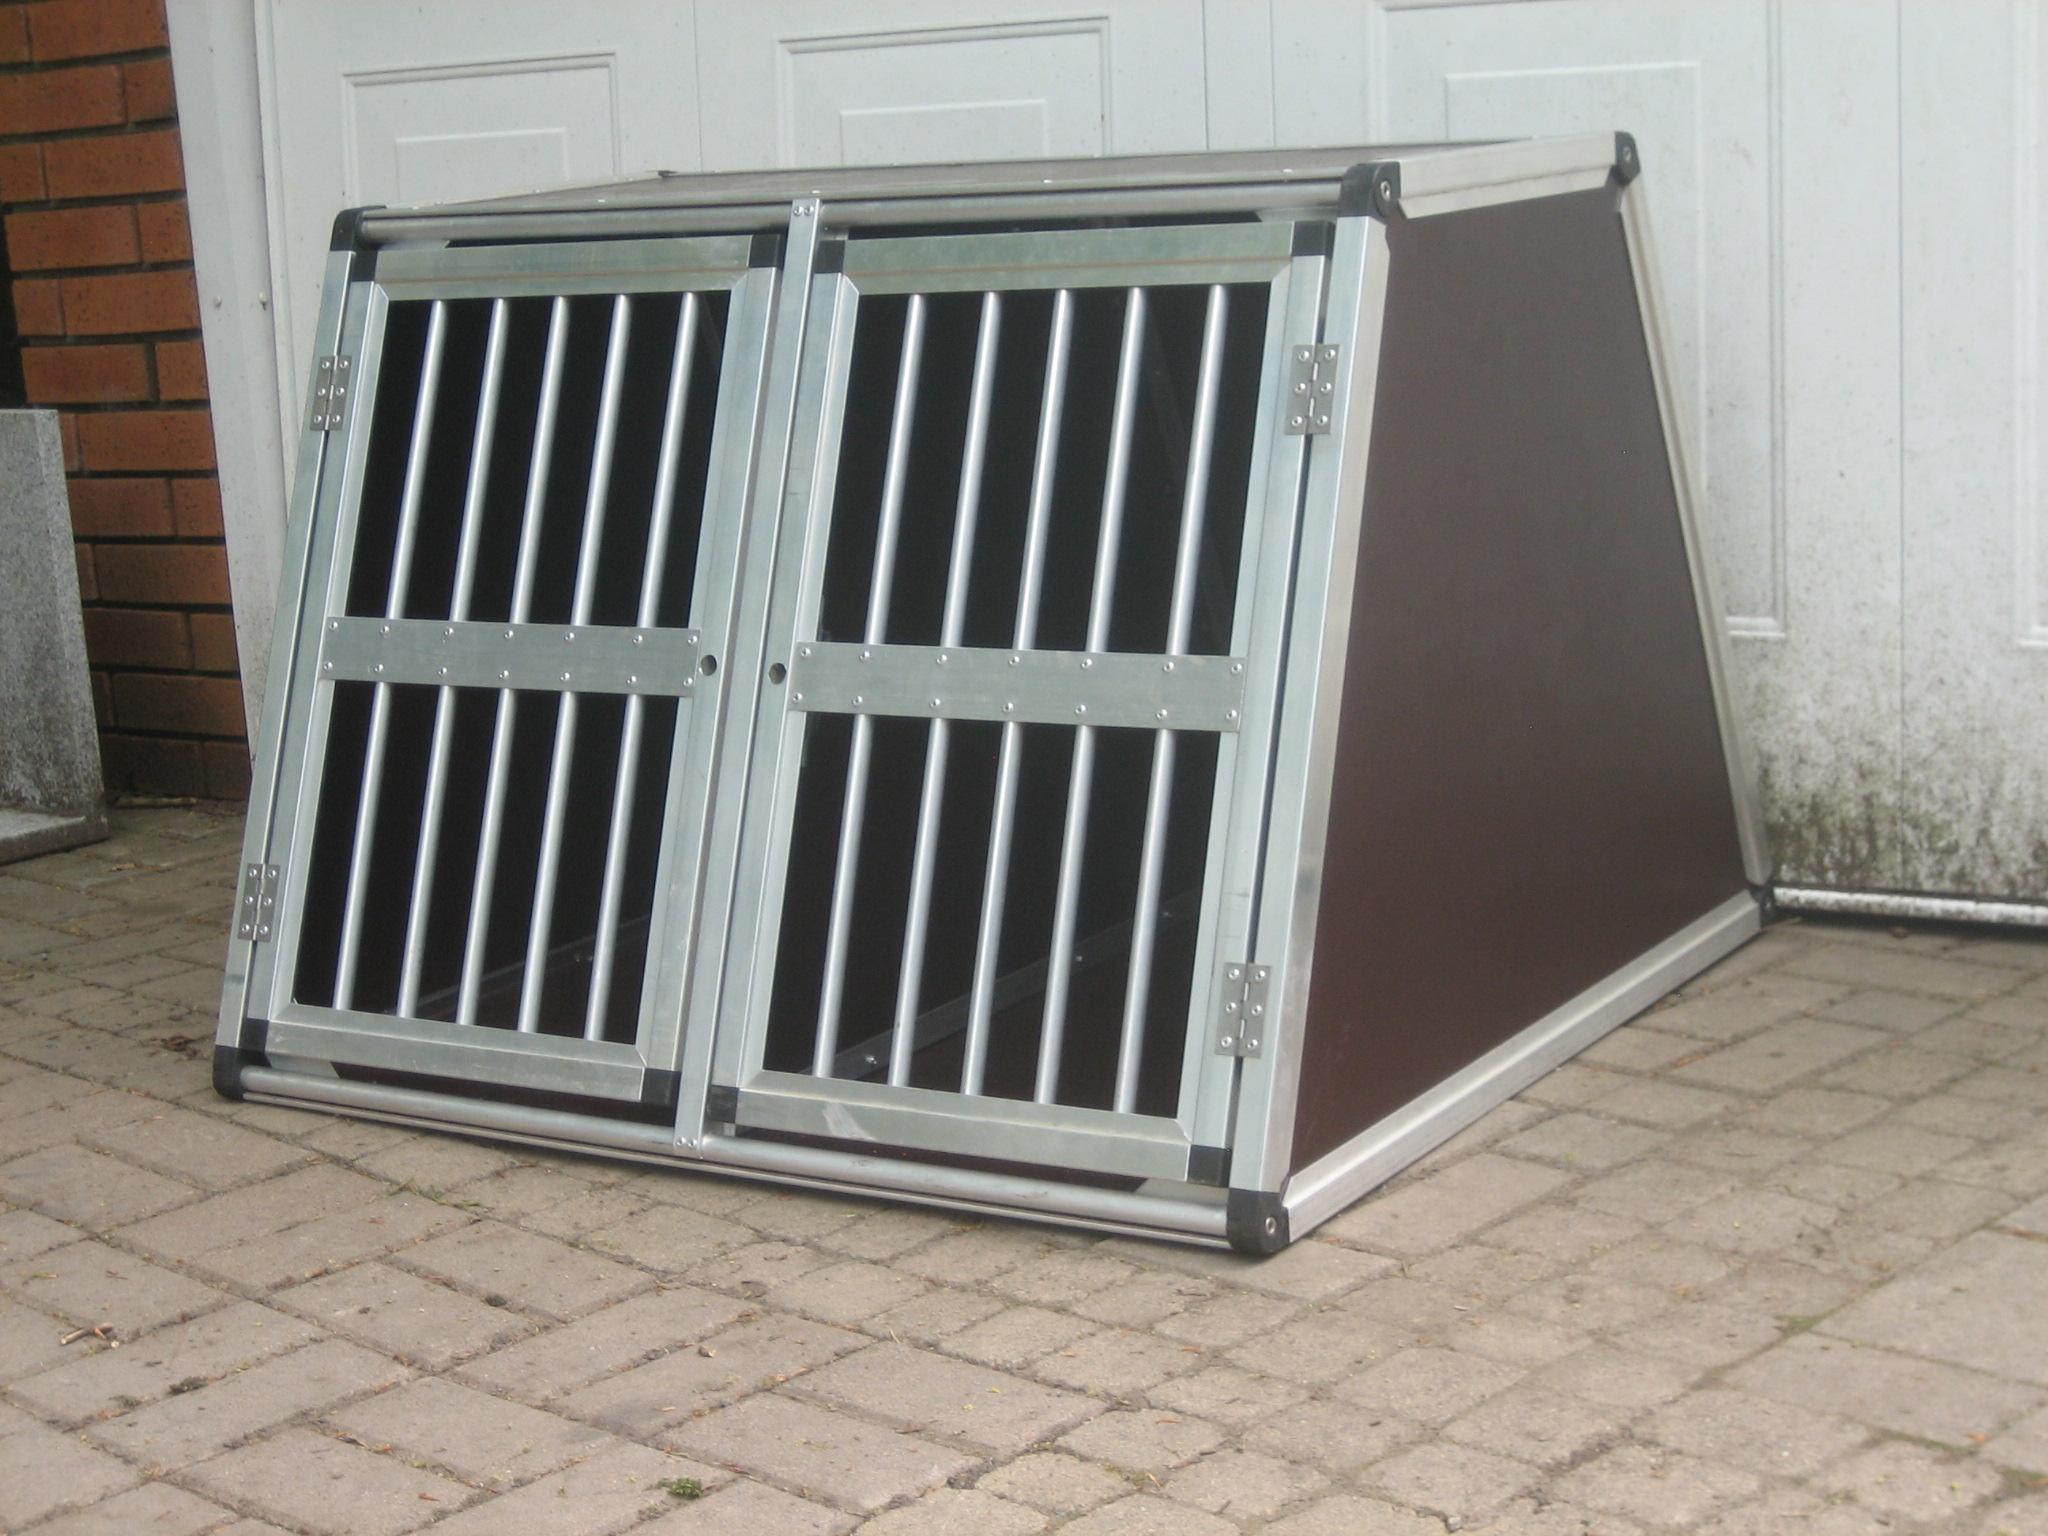 Image result for DOG RUNS FOR SALE